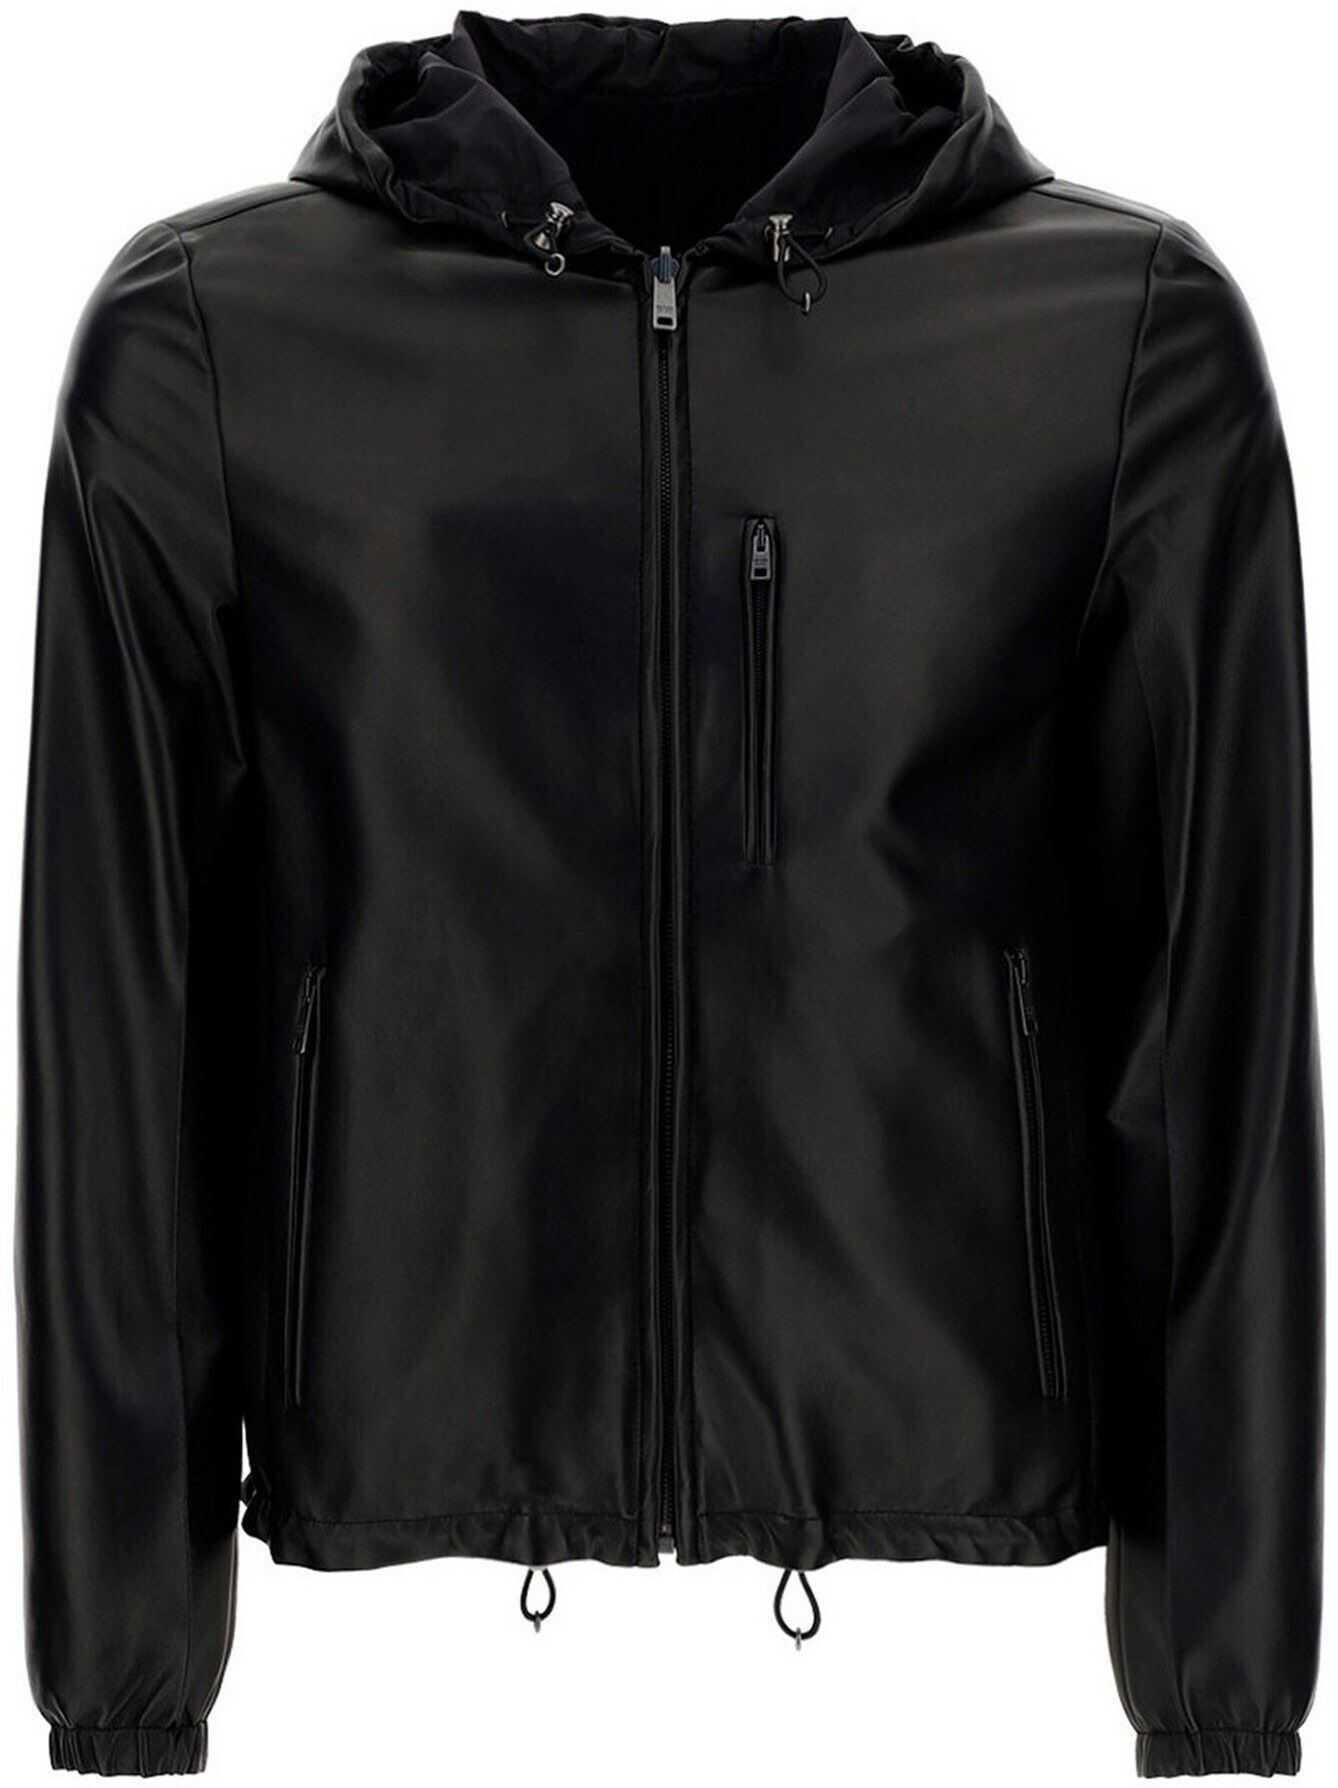 Prada Lambskin Hooded Jacket In Black Black imagine